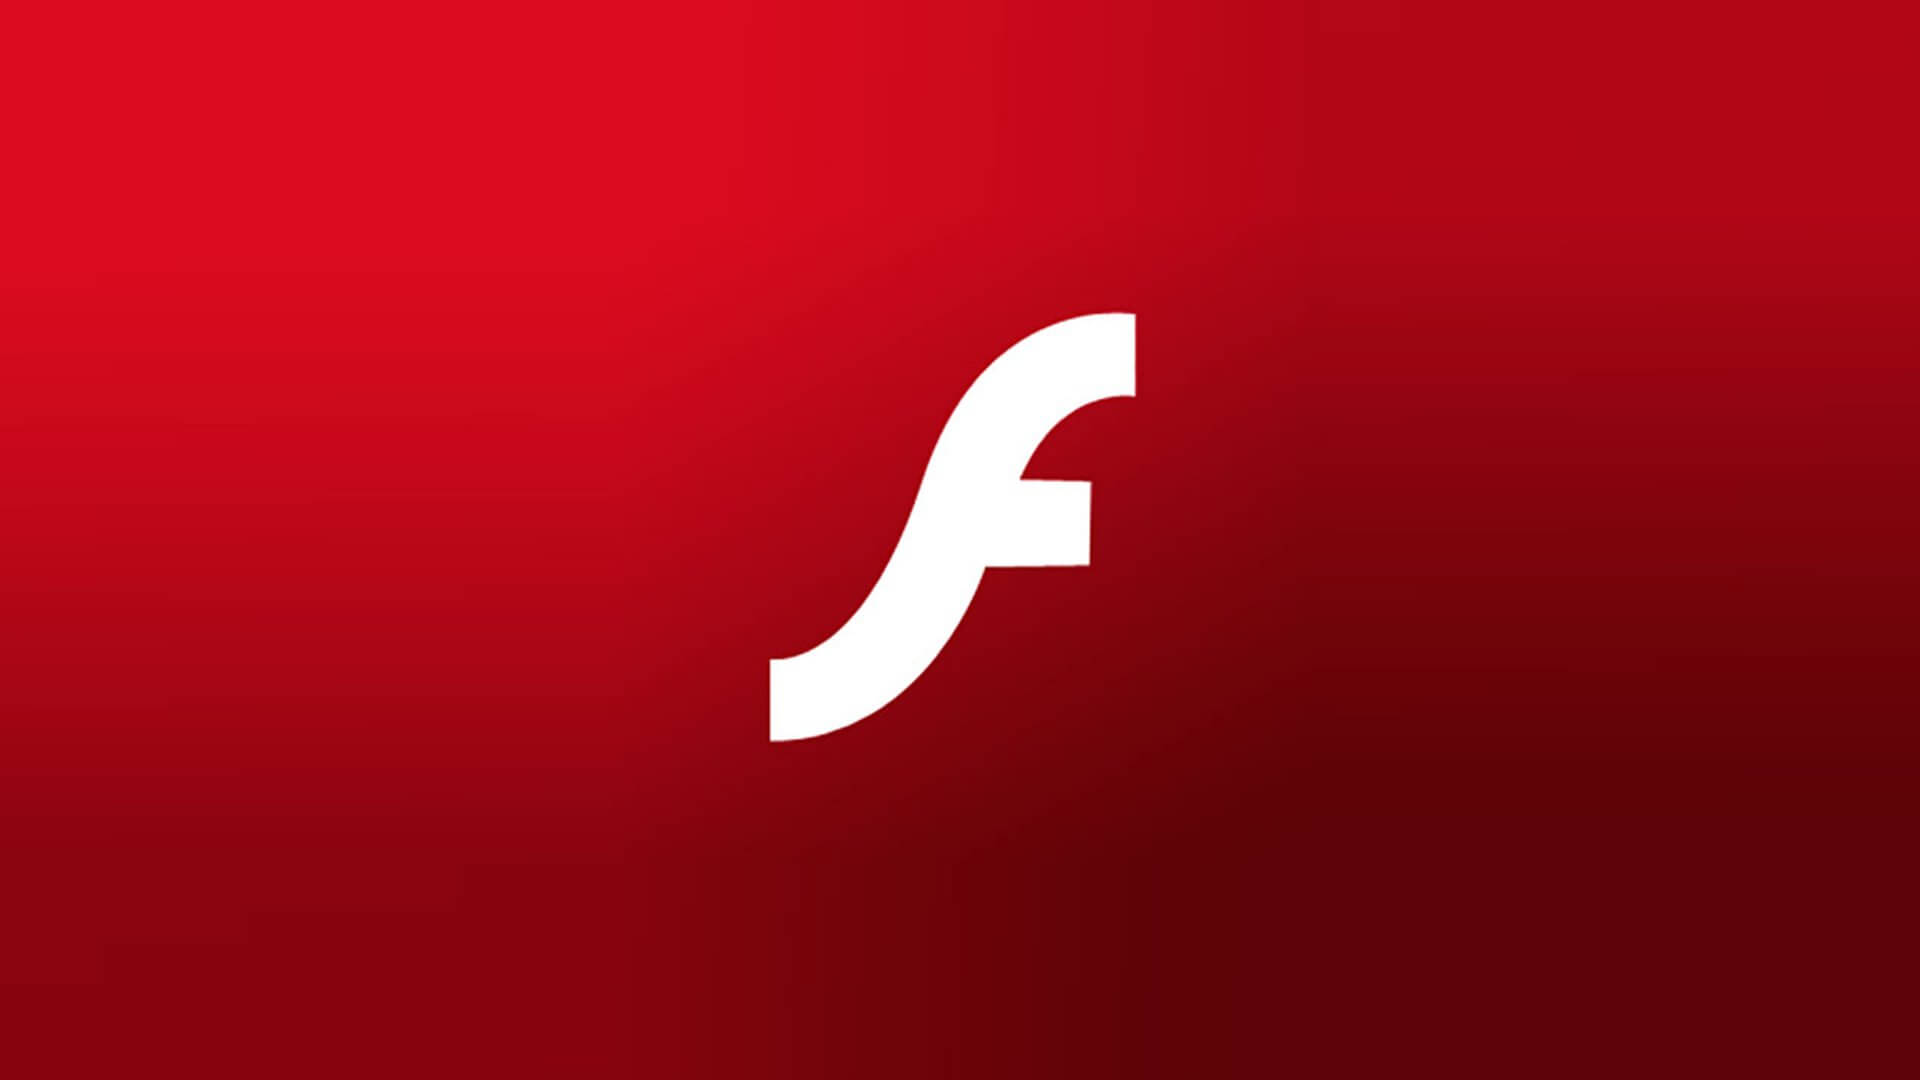 Adobe Flash | Know Your Meme